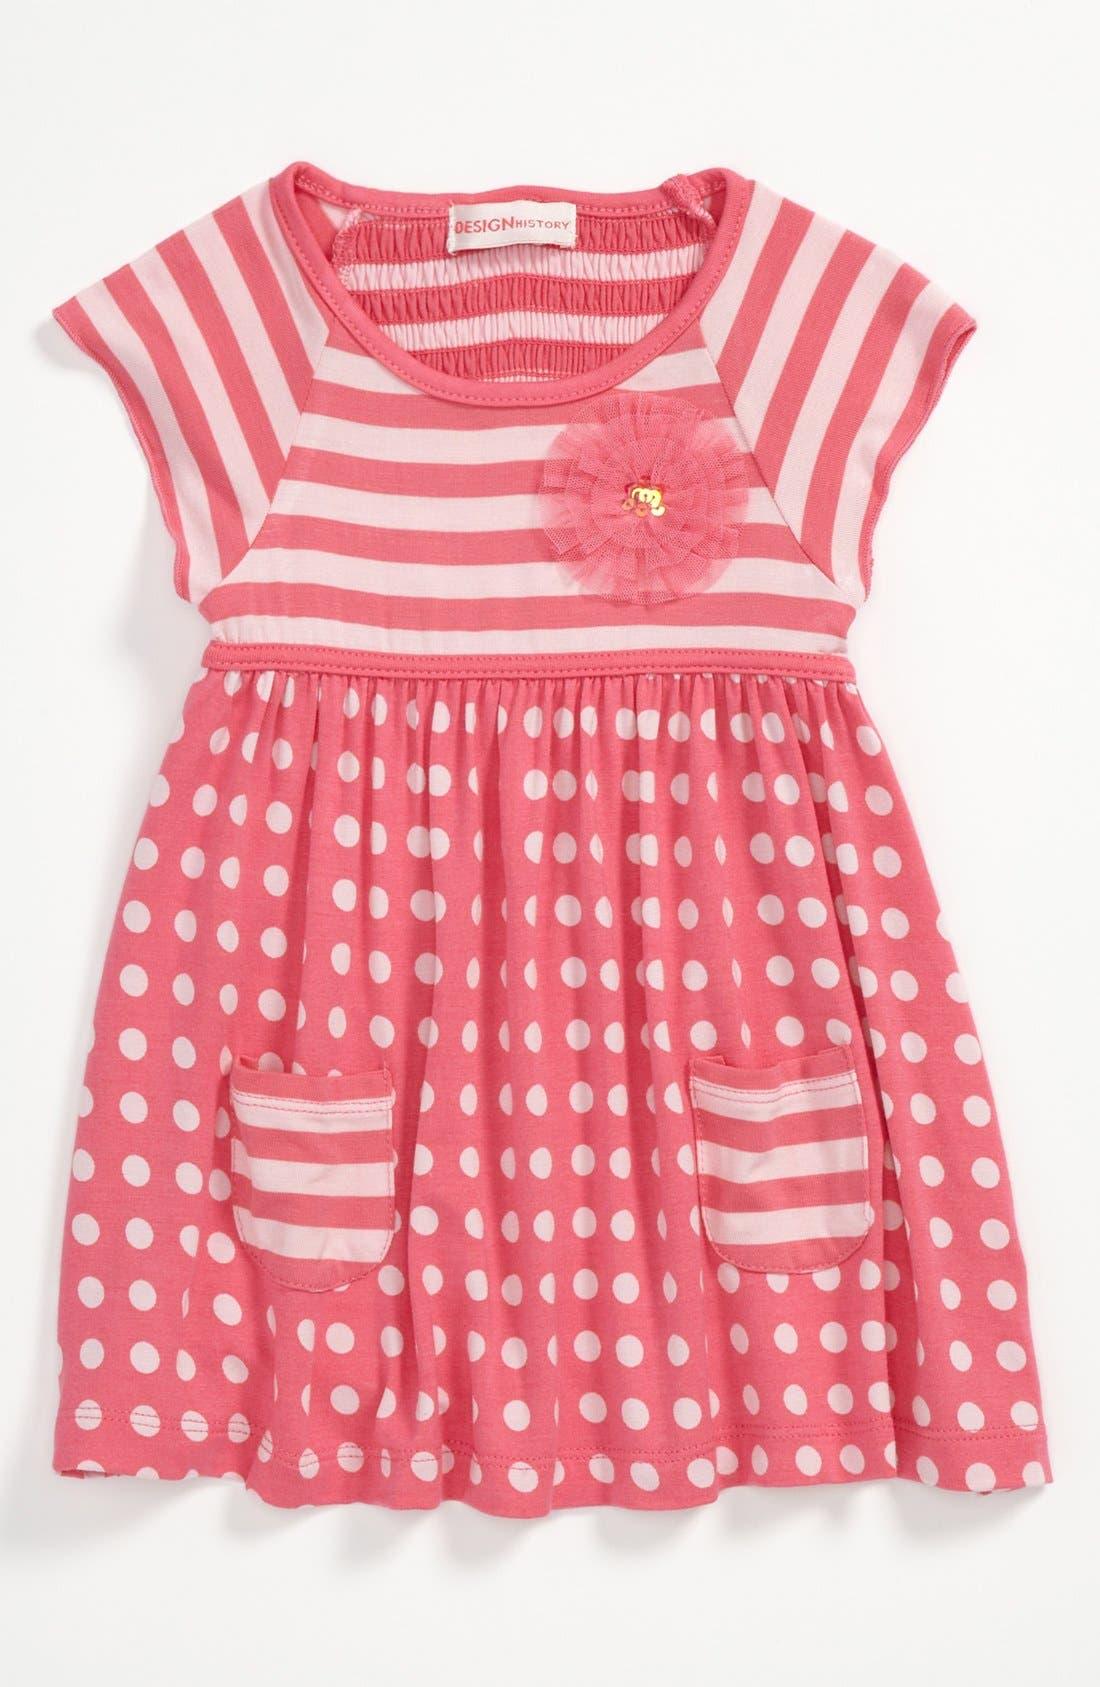 Main Image - Design History Dress (Baby)